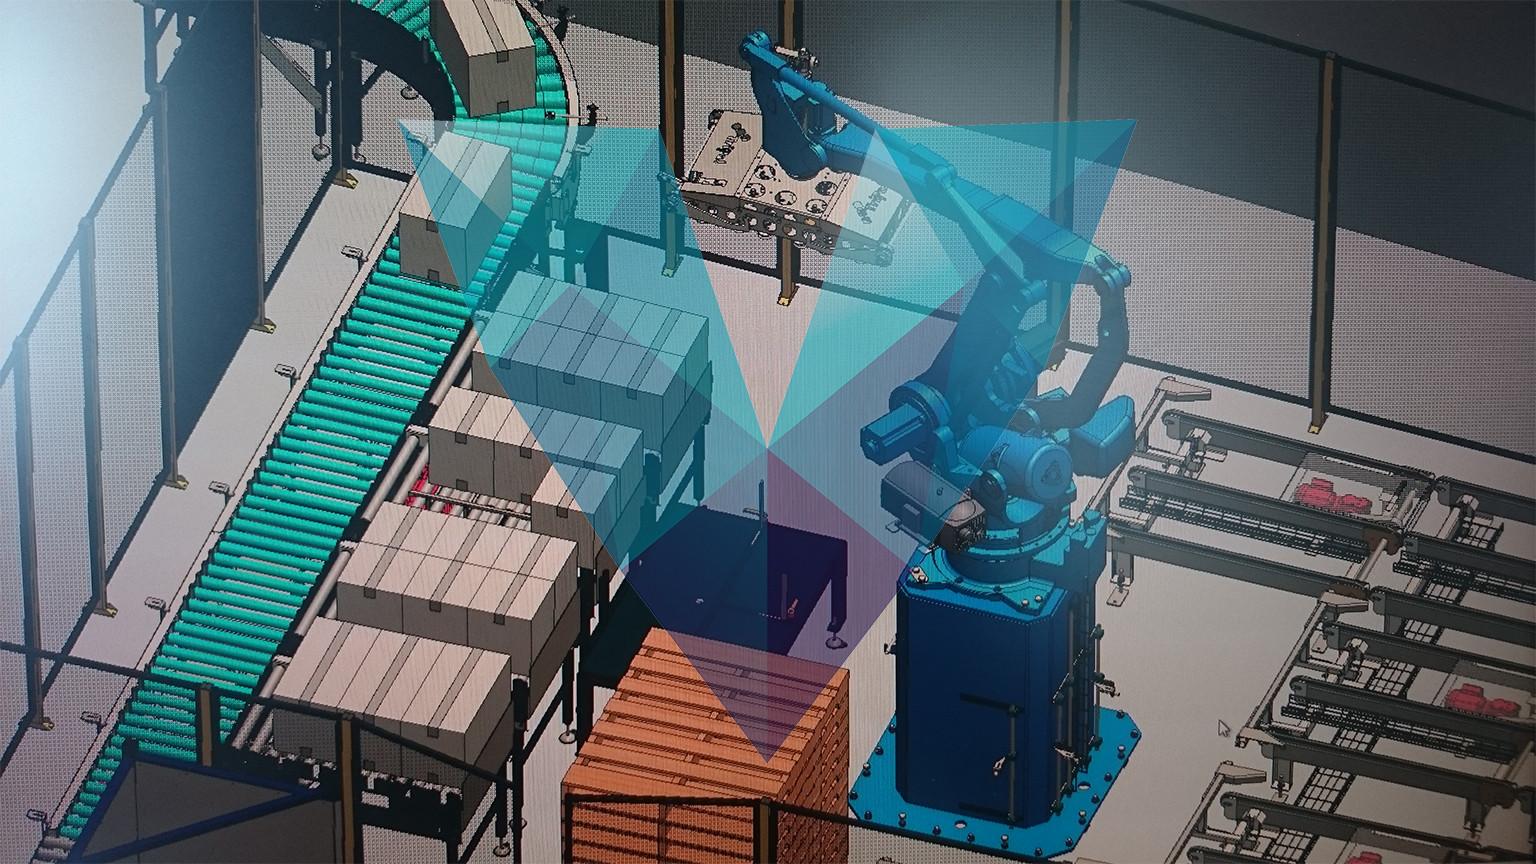 Tripal packaging robot conveyors